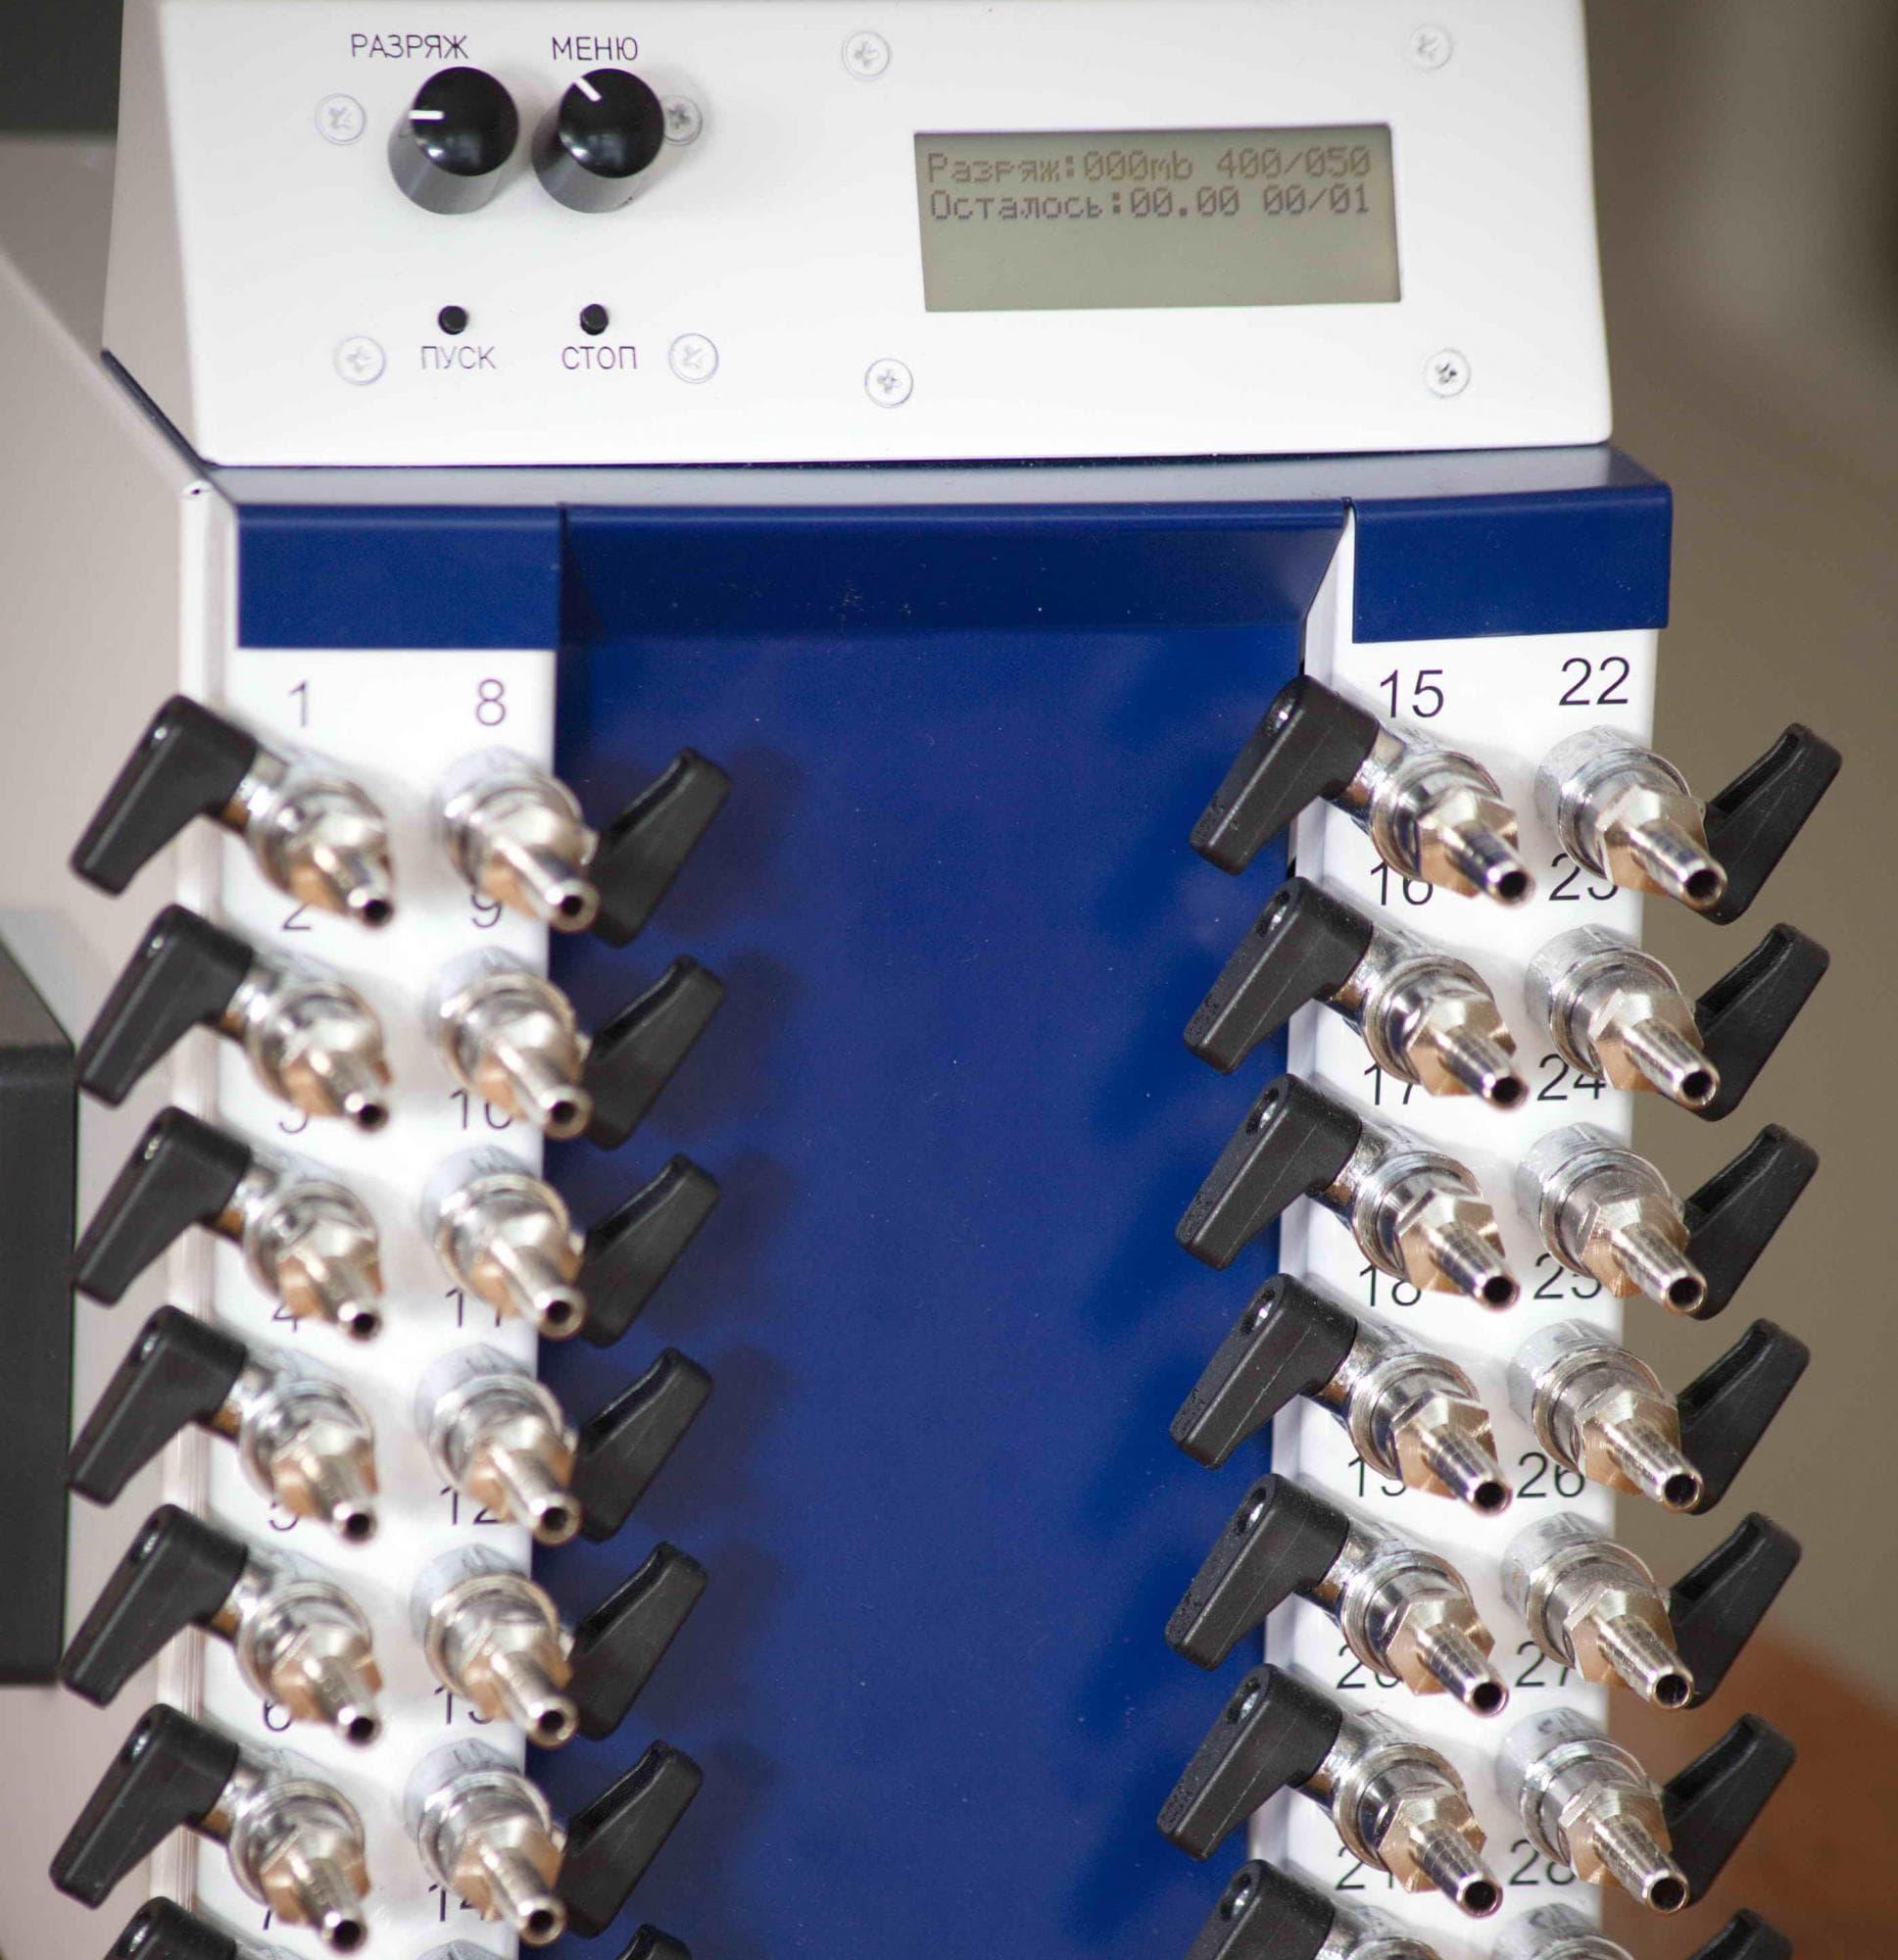 Аппараты для вакуумного массажа вакуум тонус 28э авм 28э nozomi массажер цена алиэкспресс